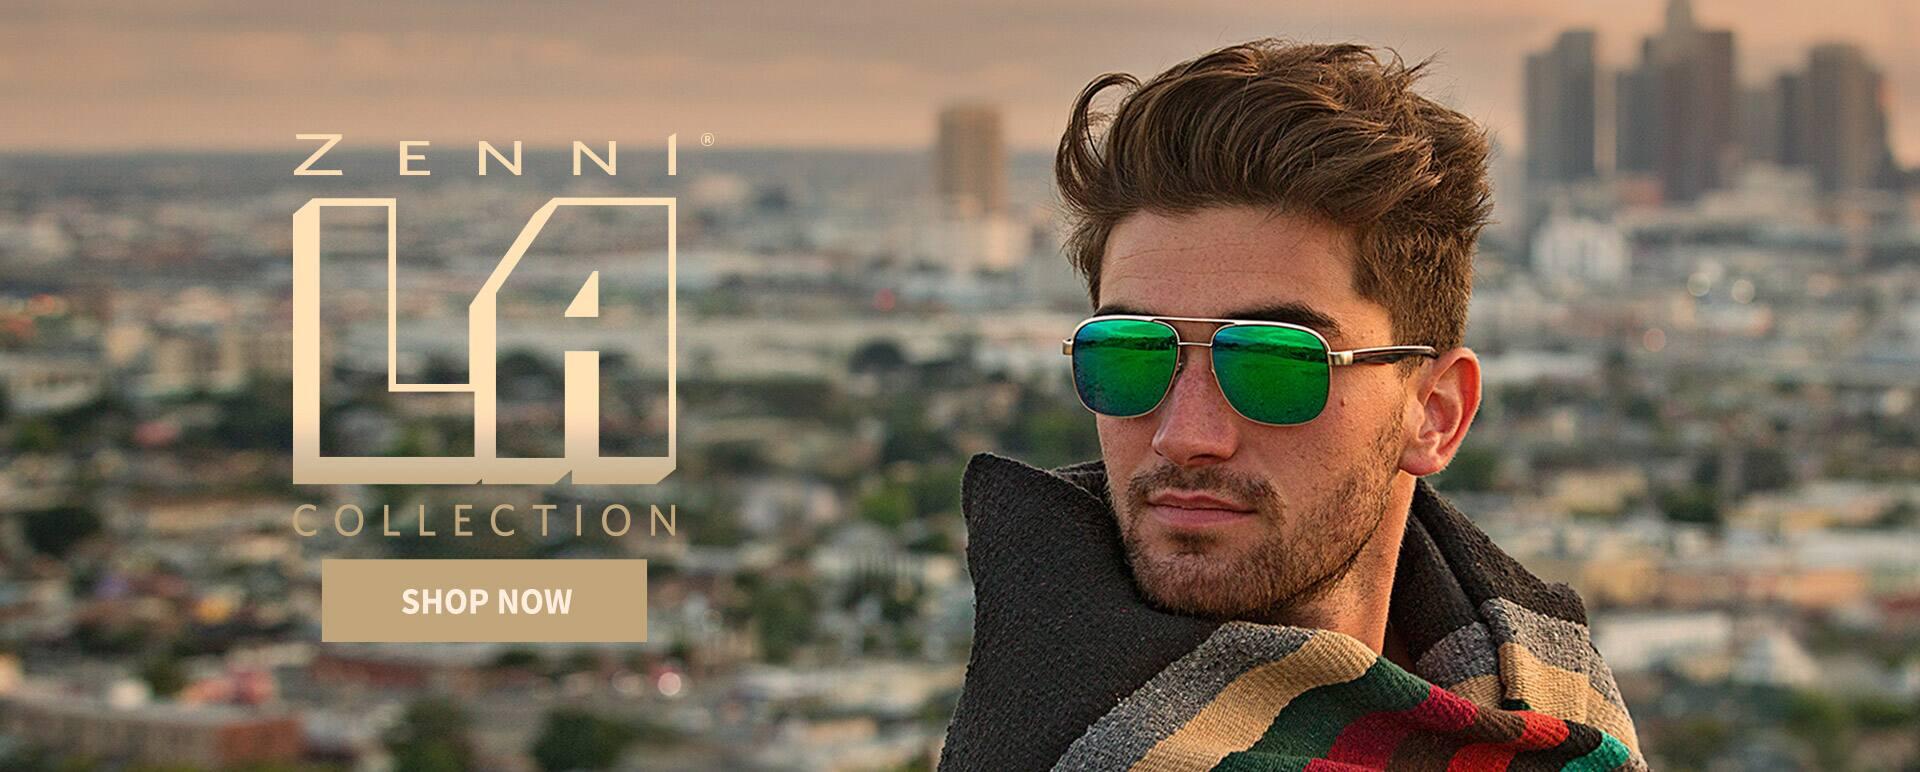 The LA Collection | Zenni Optical